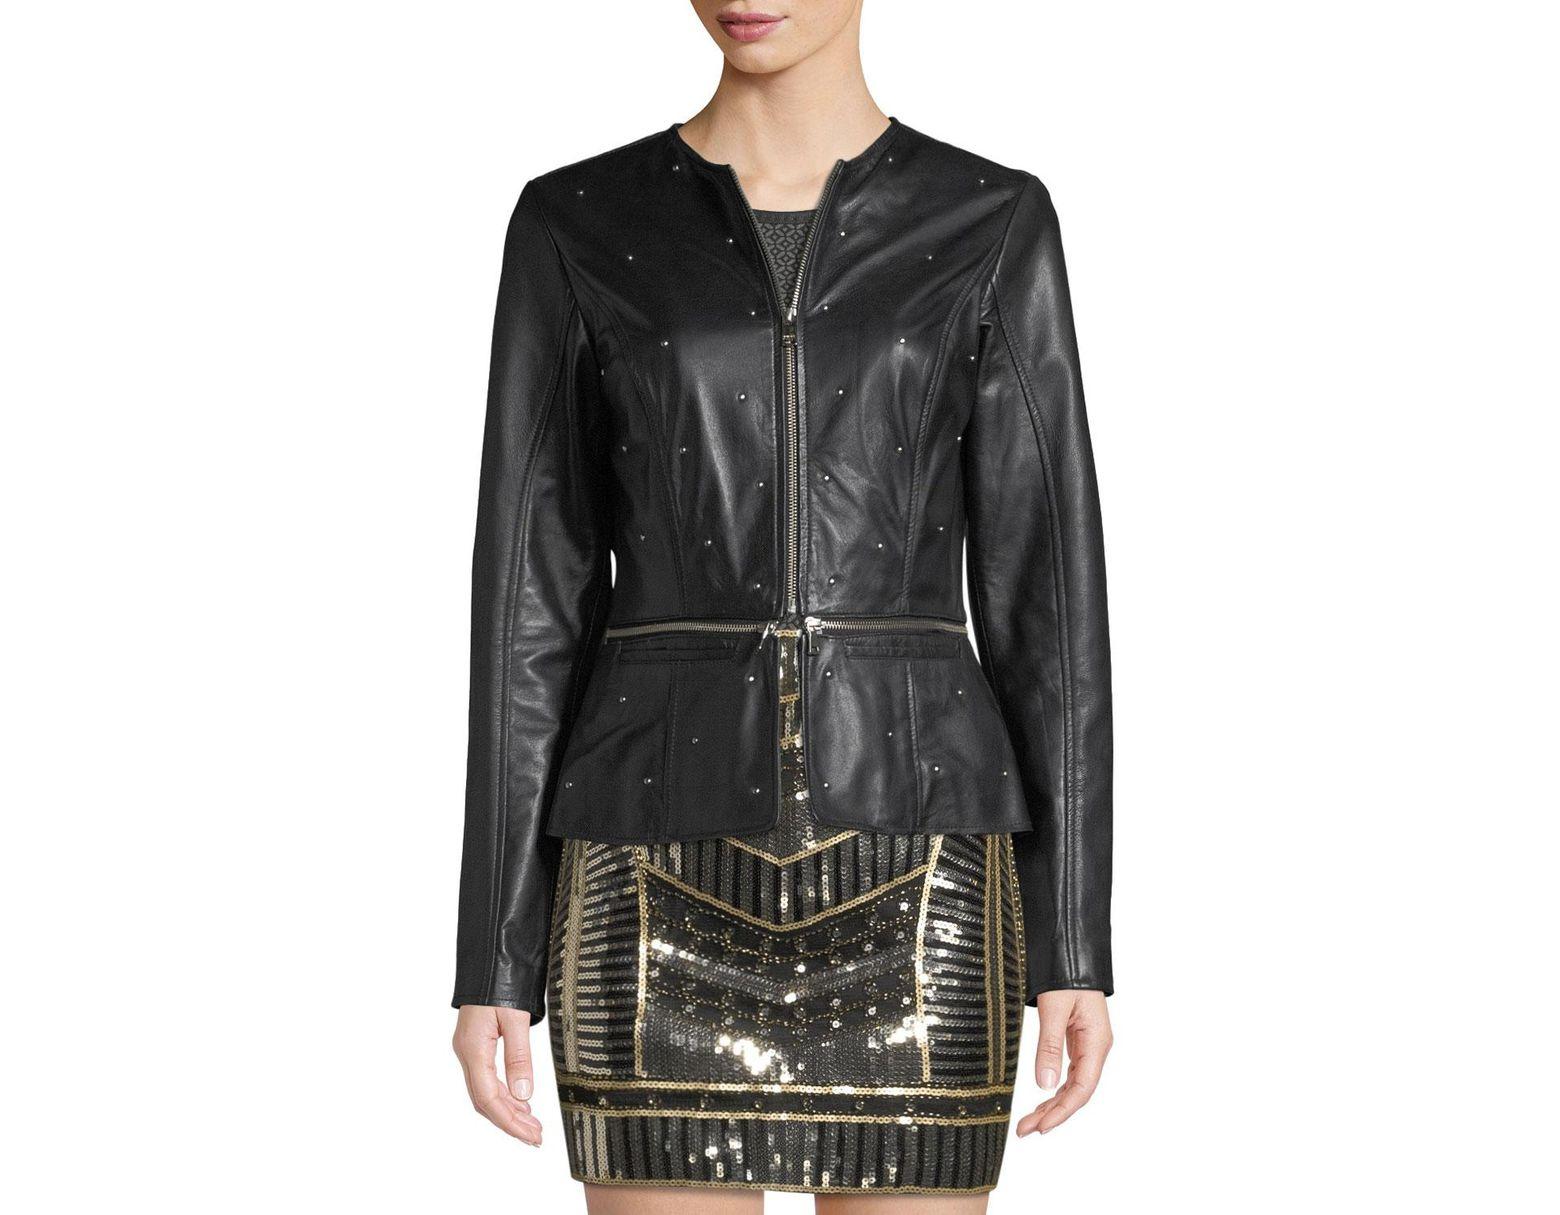 128f9a44d Women's Black Studded Leather Biker Jacket With Removable Hem